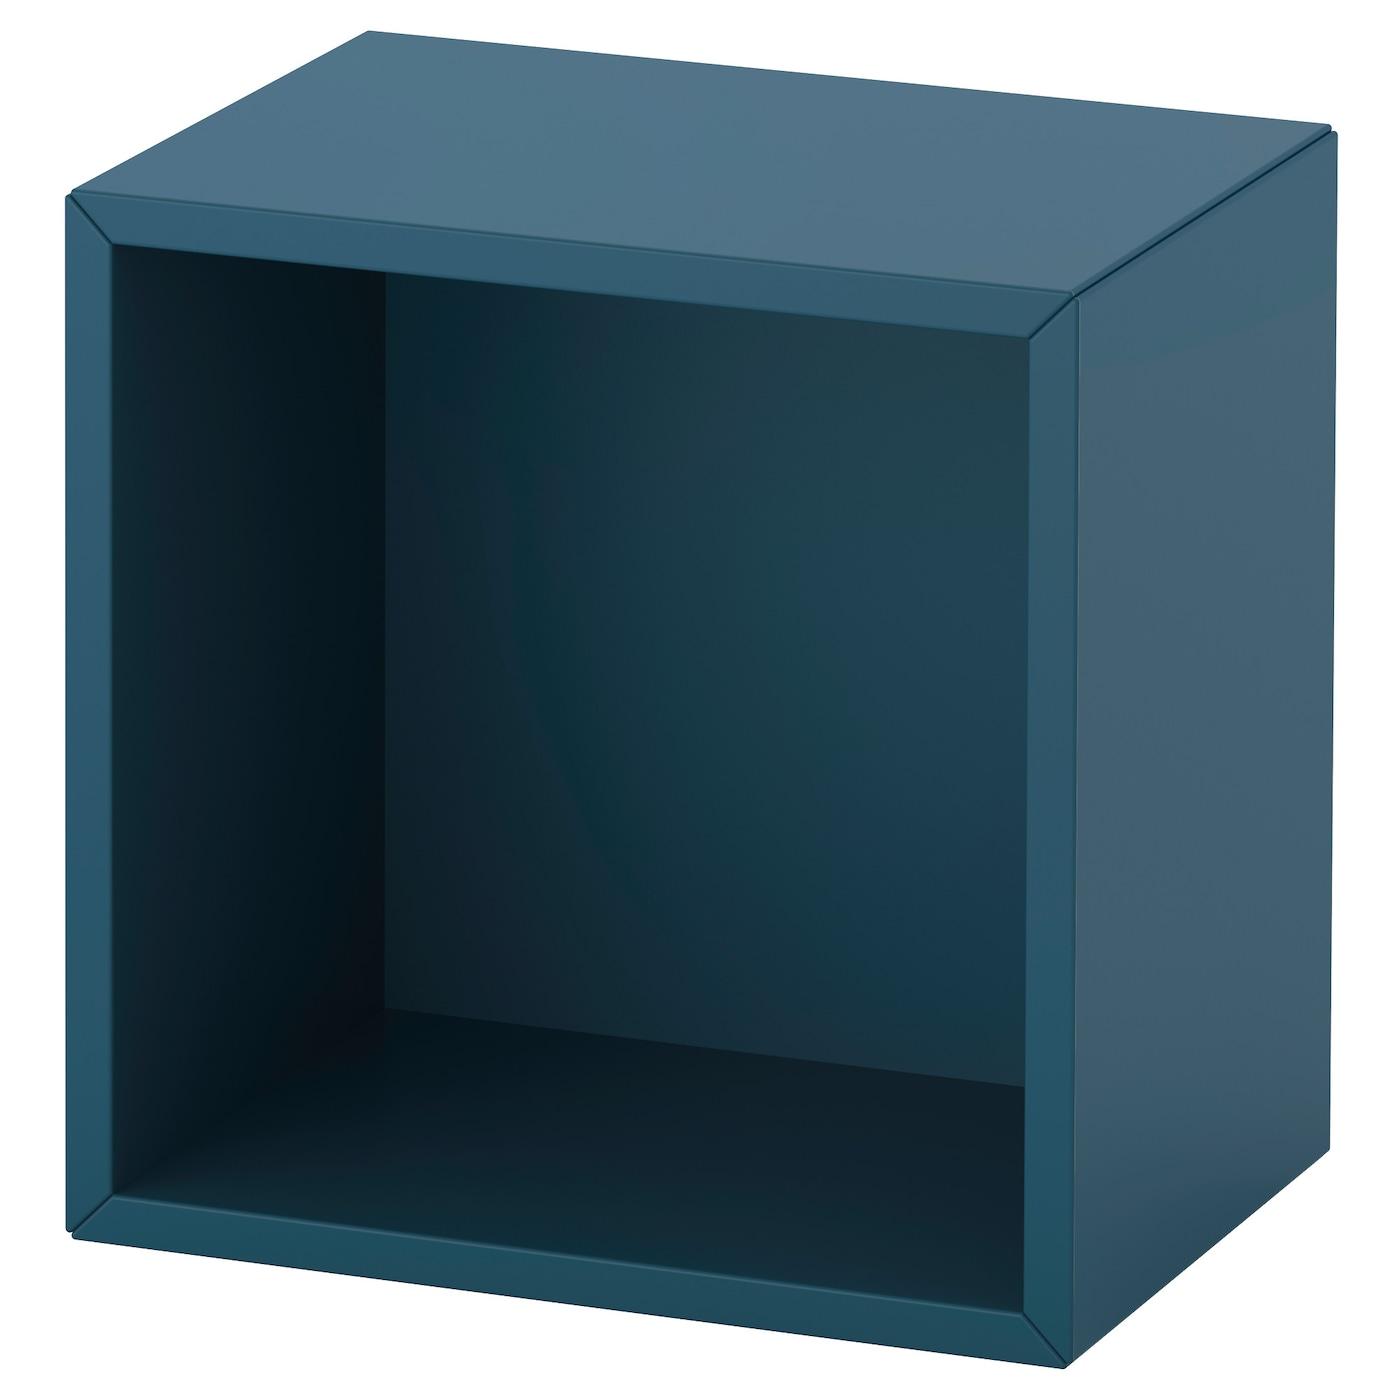 eket cabinet dark blue 35x25x35 cm ikea. Black Bedroom Furniture Sets. Home Design Ideas